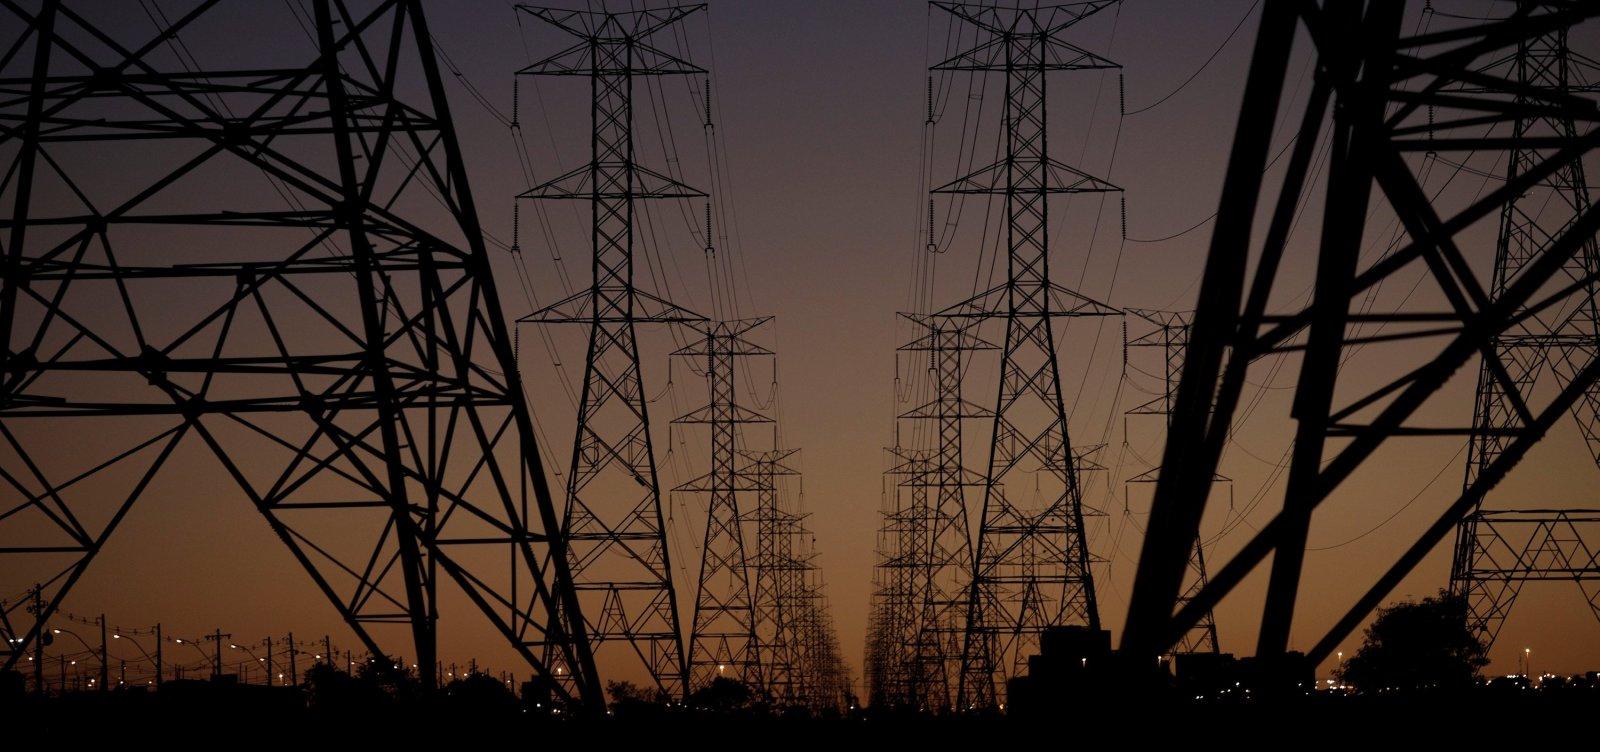 [Roraima suspende uso de energia da Venezuela após apagões no estado]